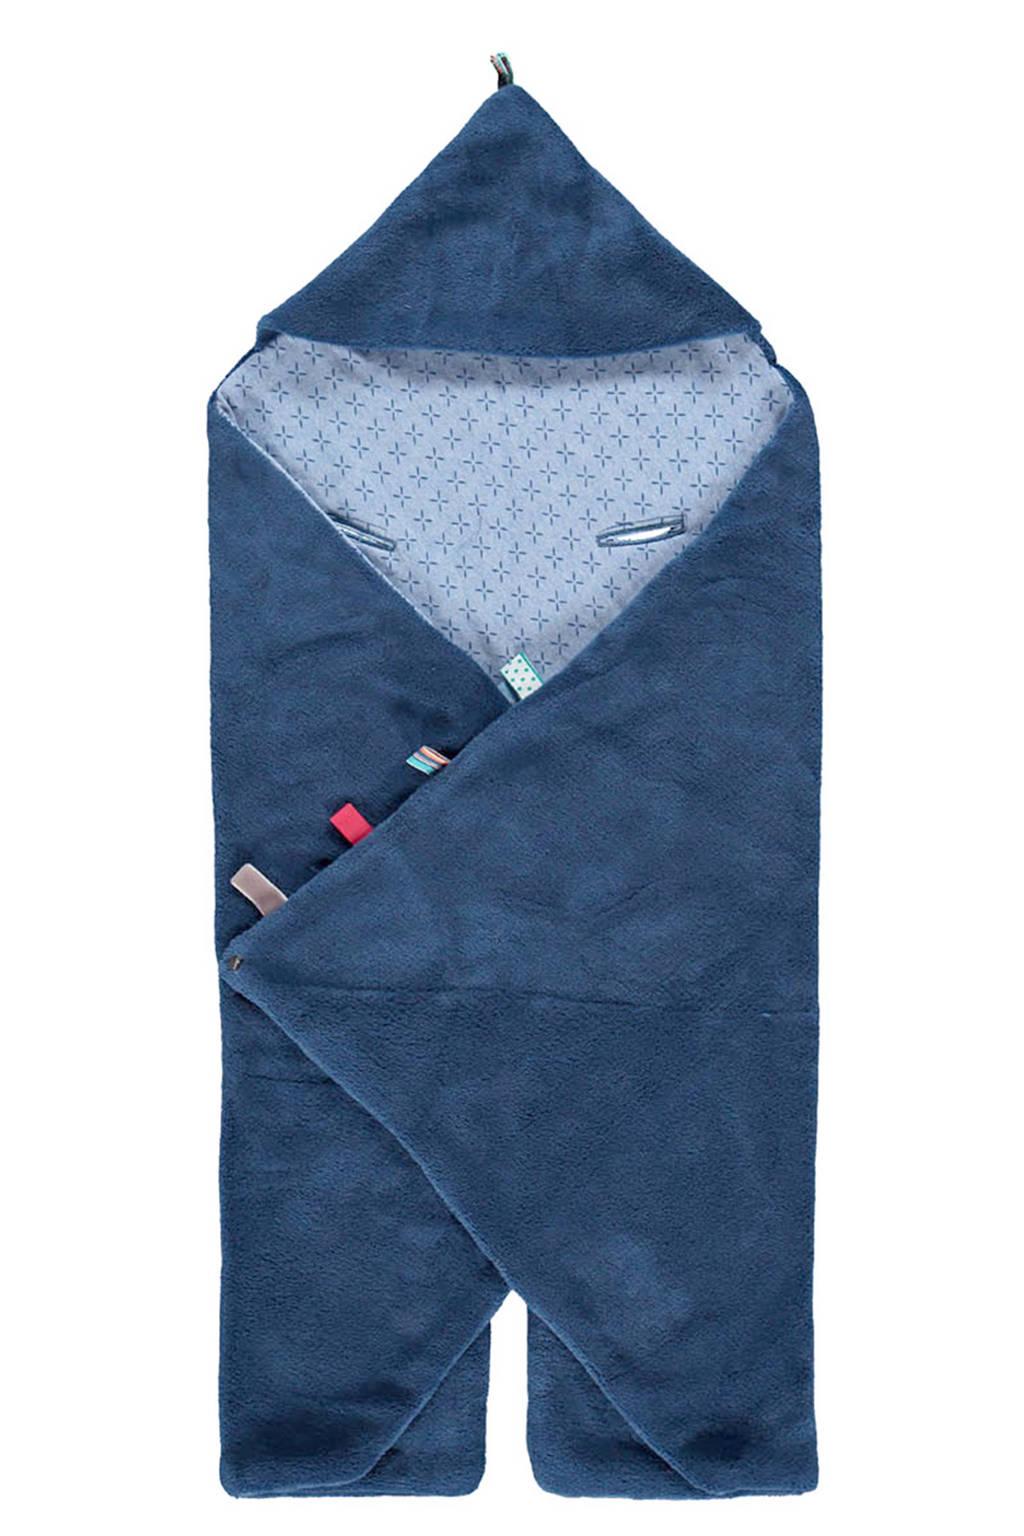 Snoozebaby Trendy Wrapping wikkeldeken indigo blue